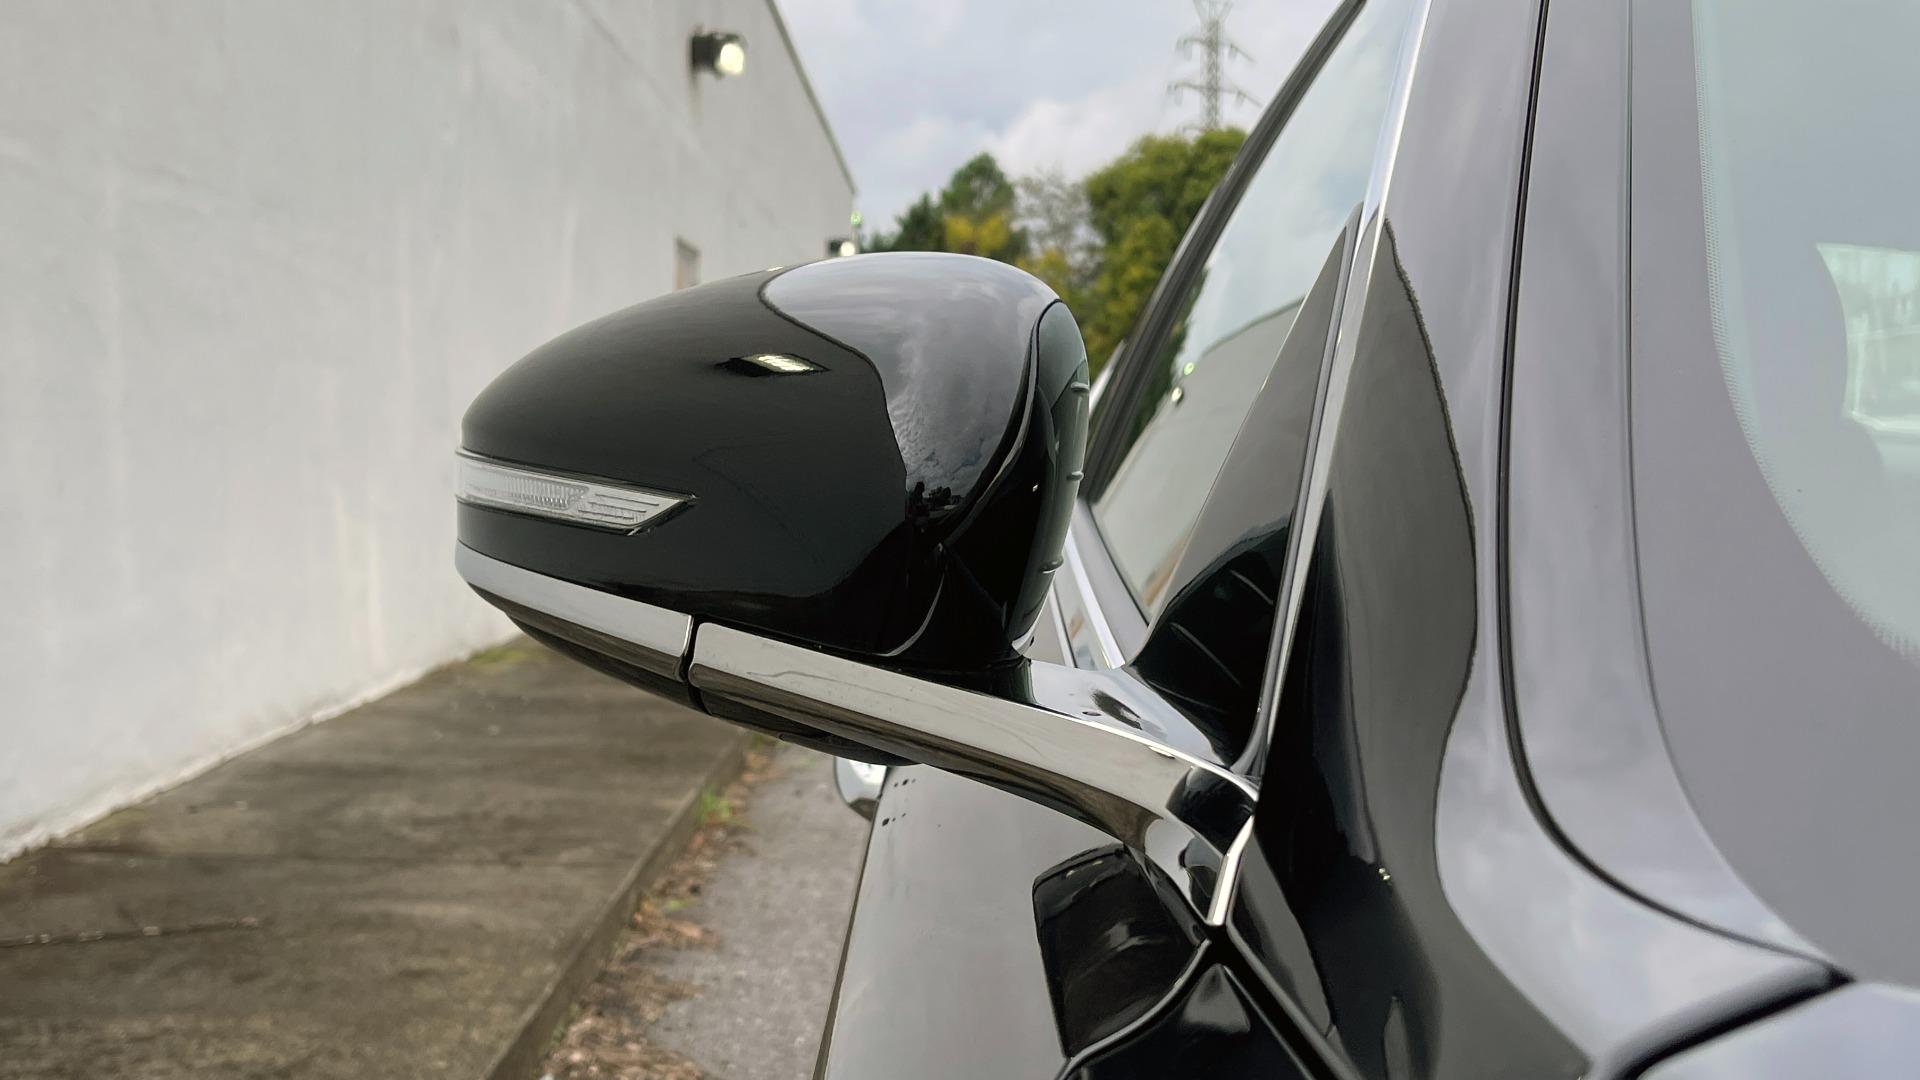 Used 2021 Genesis G70 ELITE 2.0T SEDAN / NAV / LANE ASST / BSA / SUNROOF / LEATHER / REARVIEW for sale $39,995 at Formula Imports in Charlotte NC 28227 10